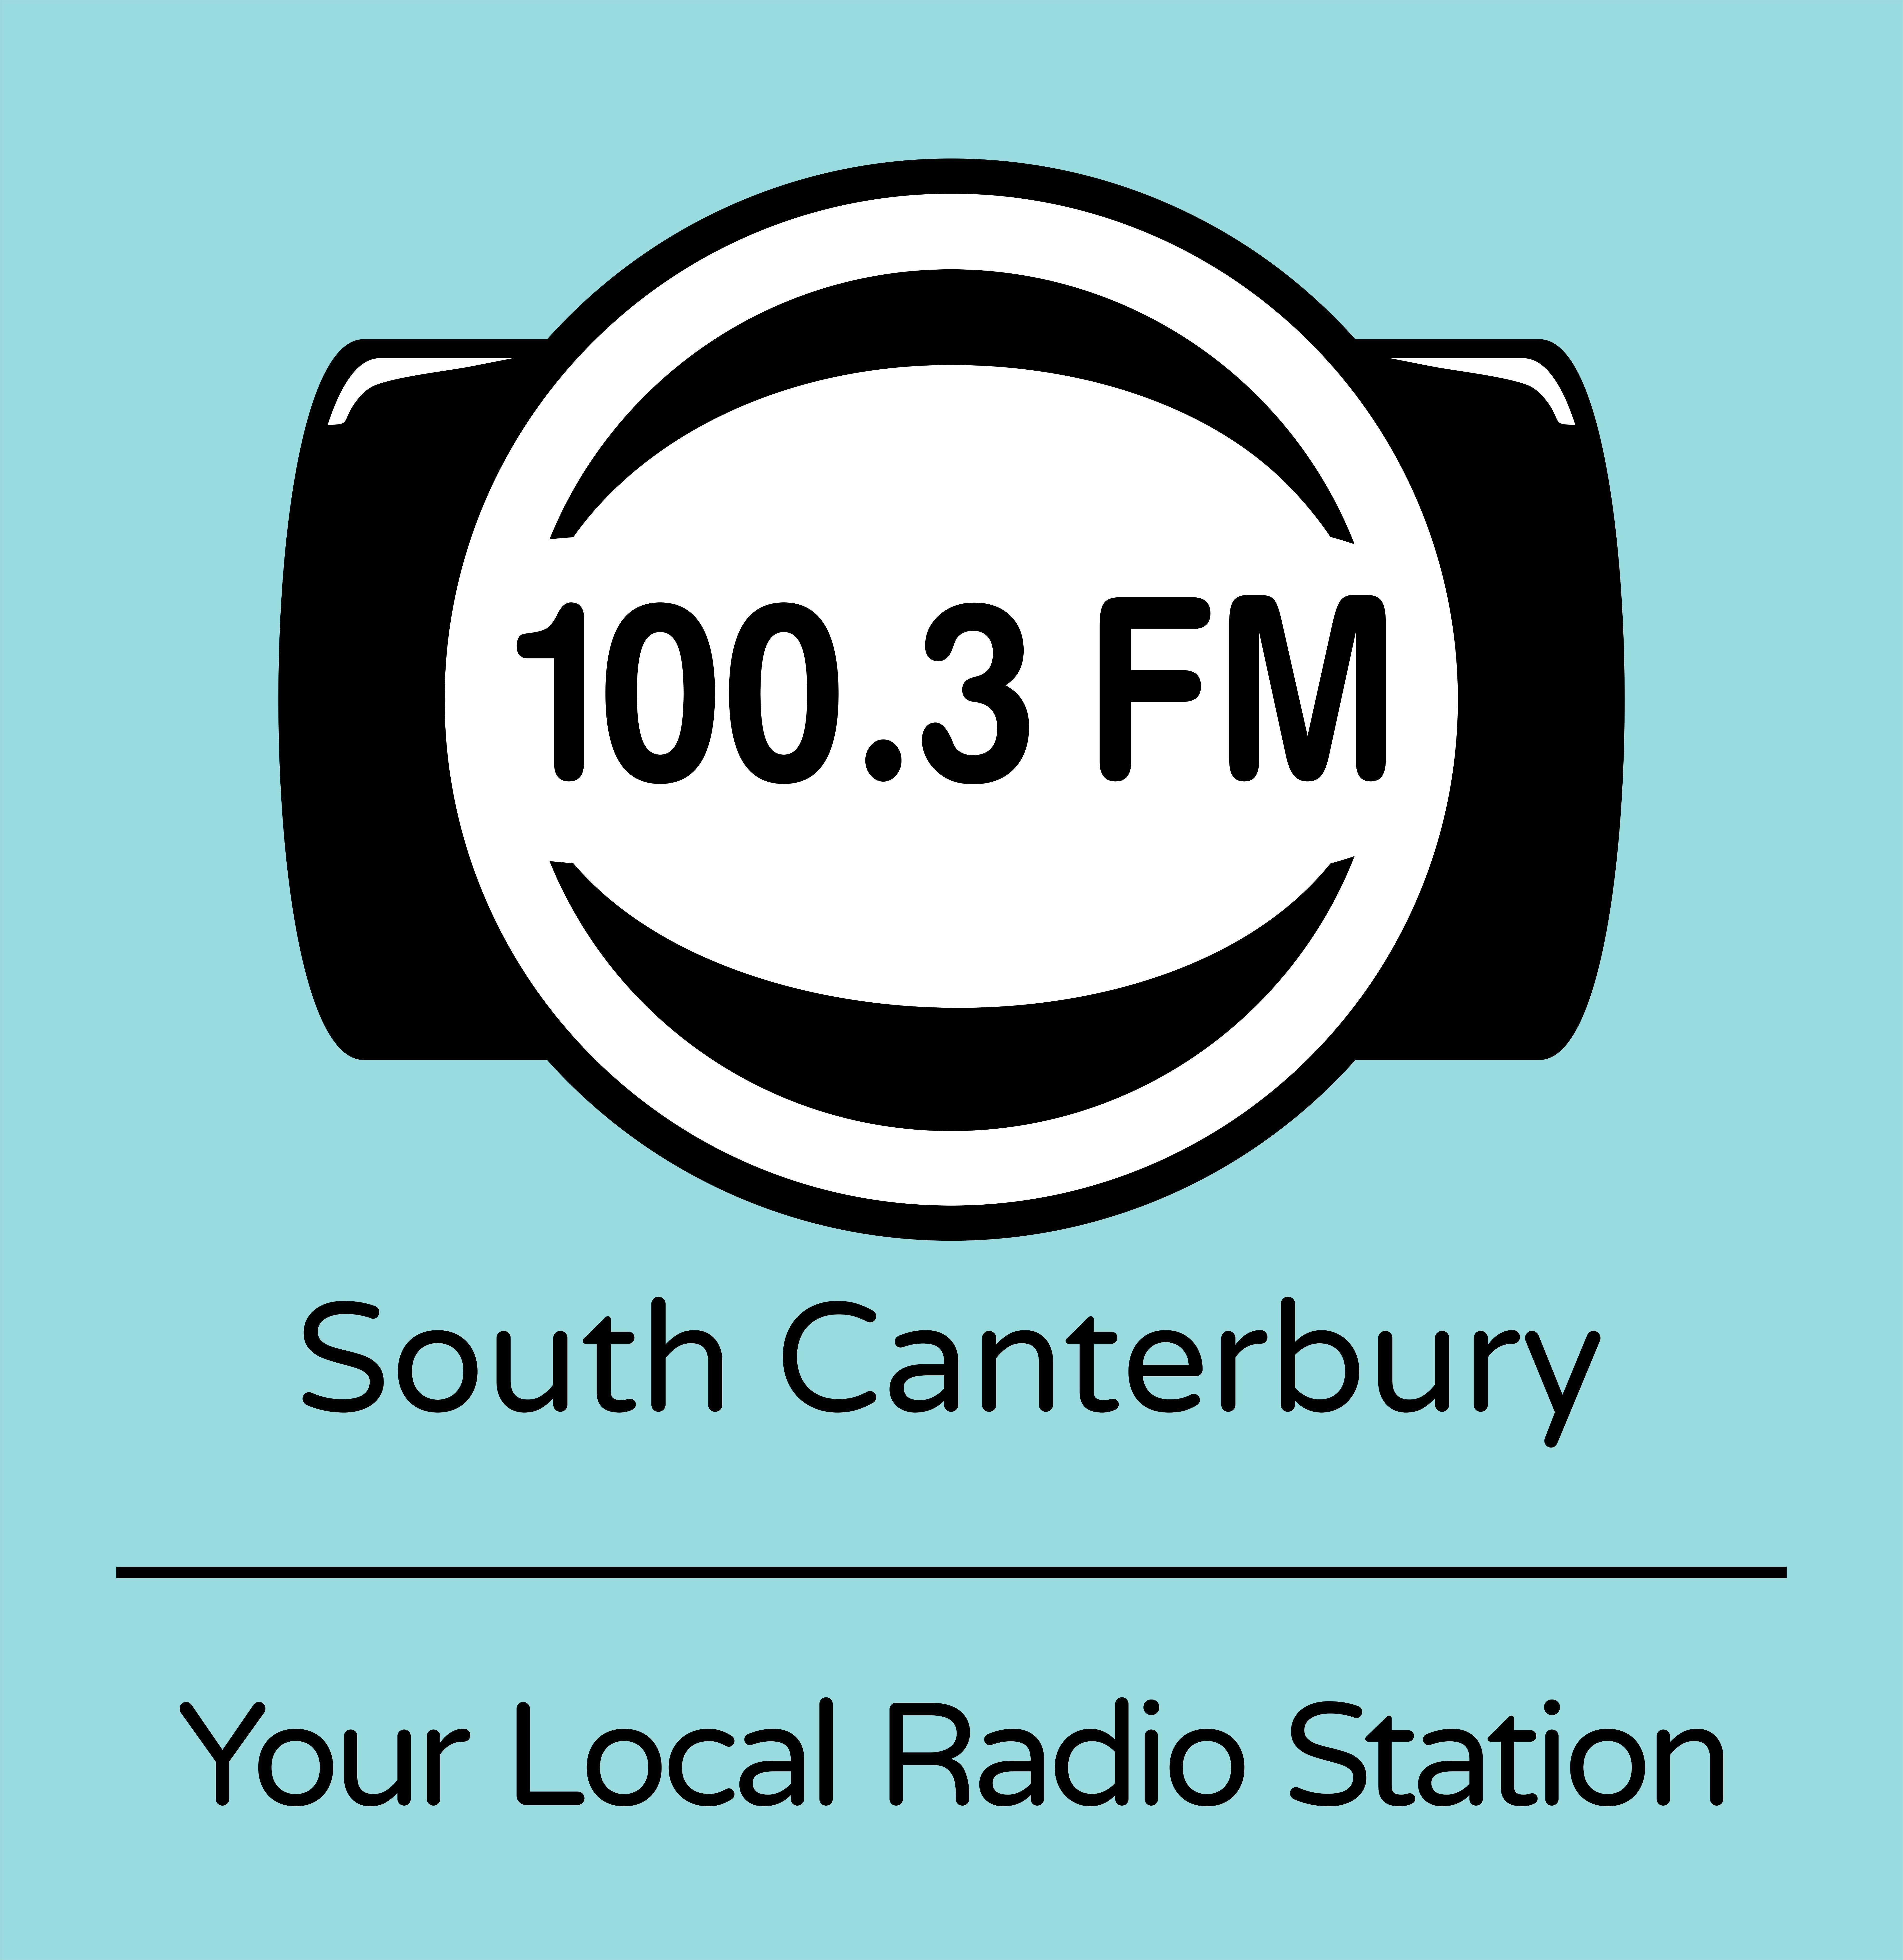 New Zealand Radio Stations' Brand Profiles | The Radio Bureau